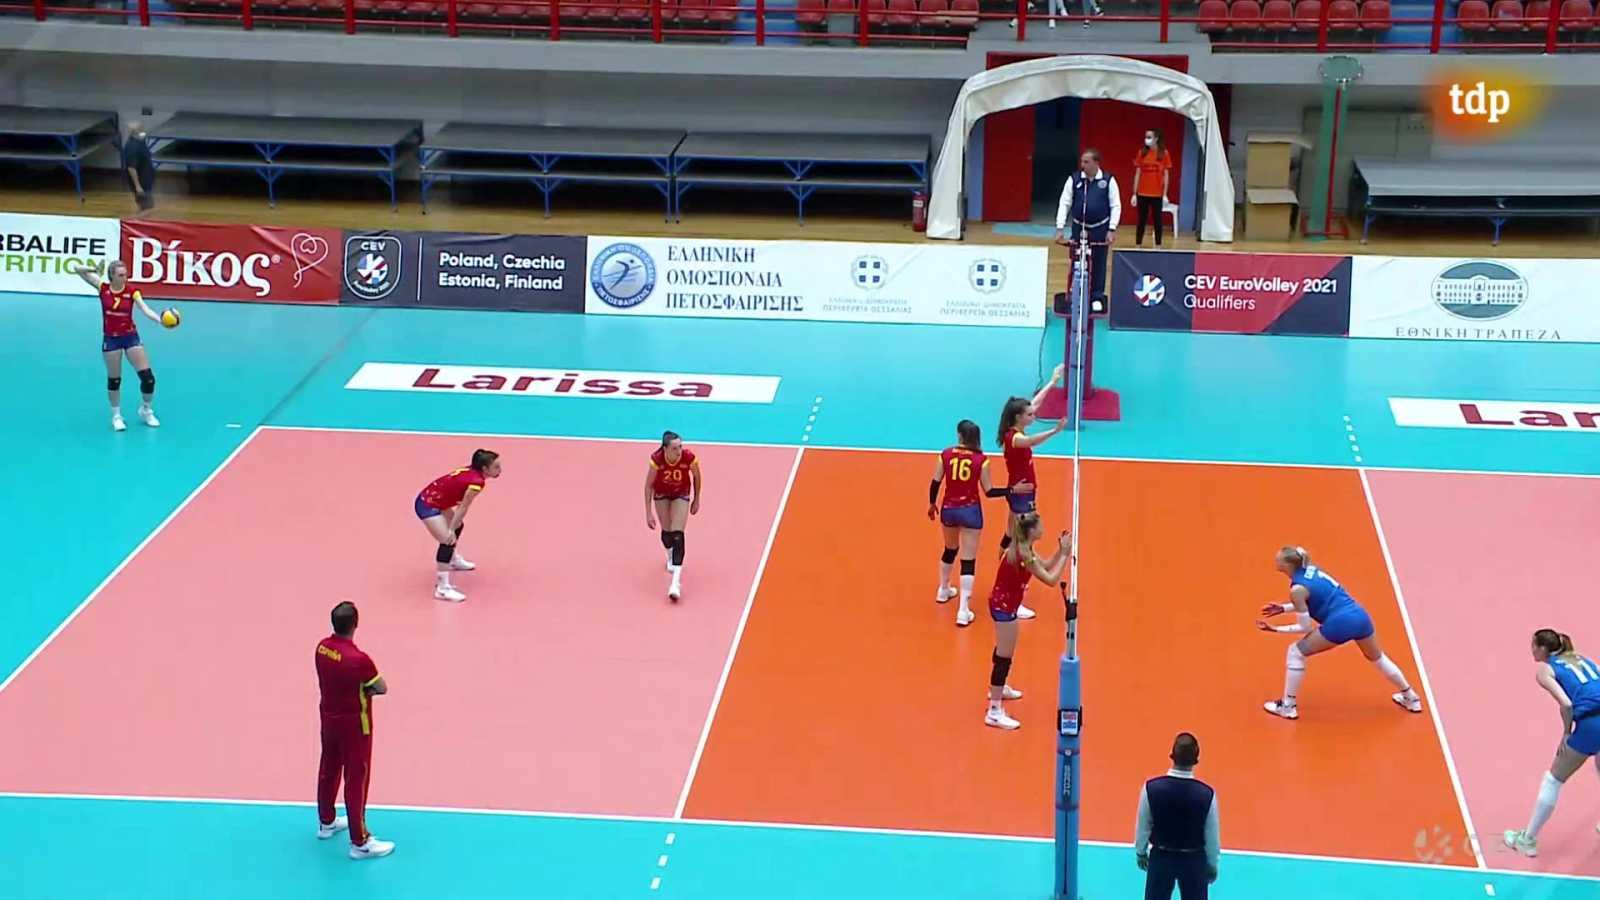 Voleibol - Clasificación Campeonato de Europa Femenino. 2ª jornada: España - Grecia - ver ahora